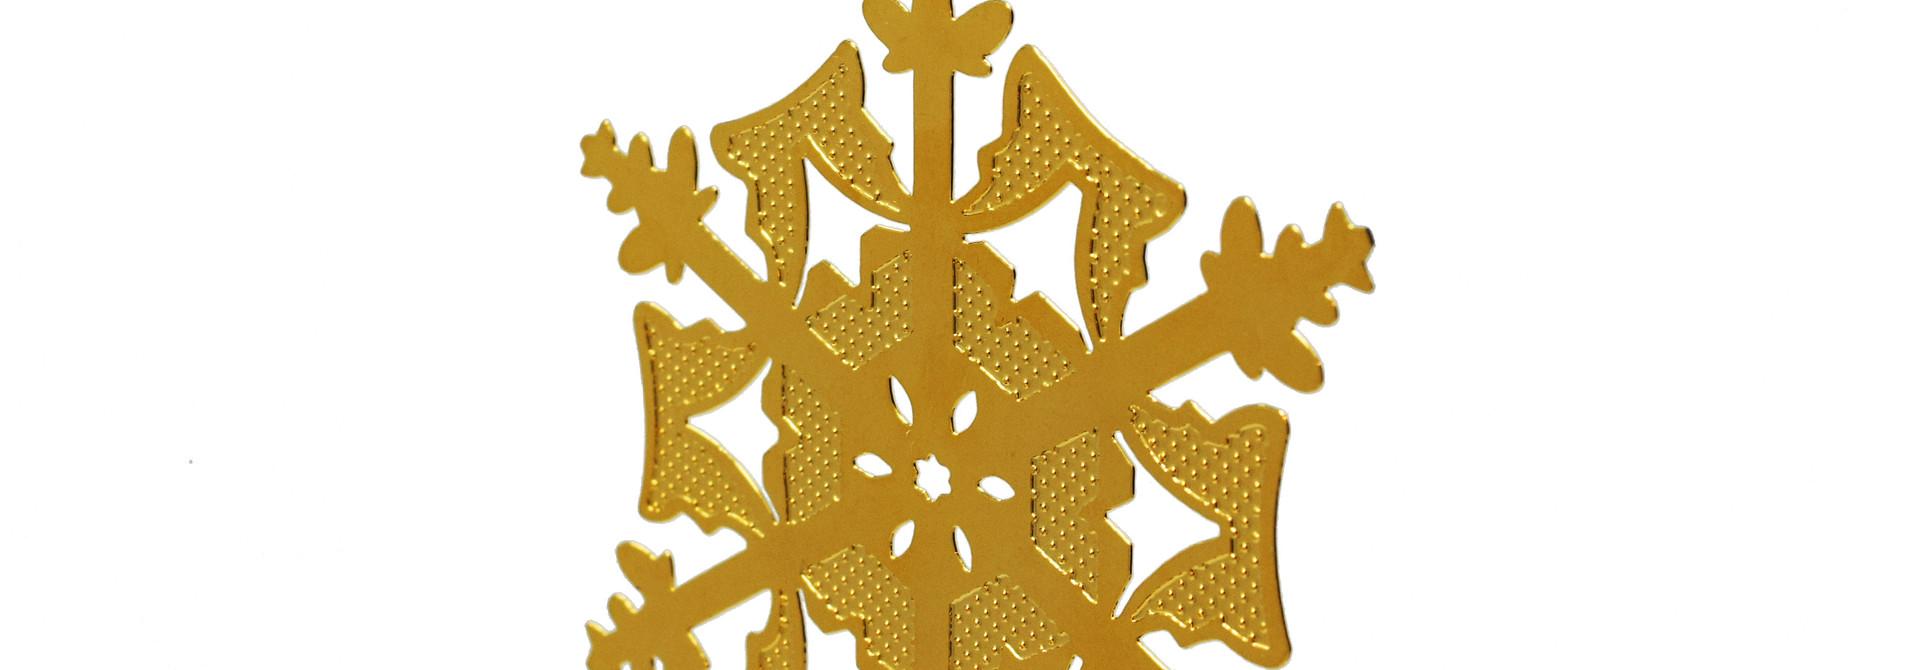 Textured snowflake